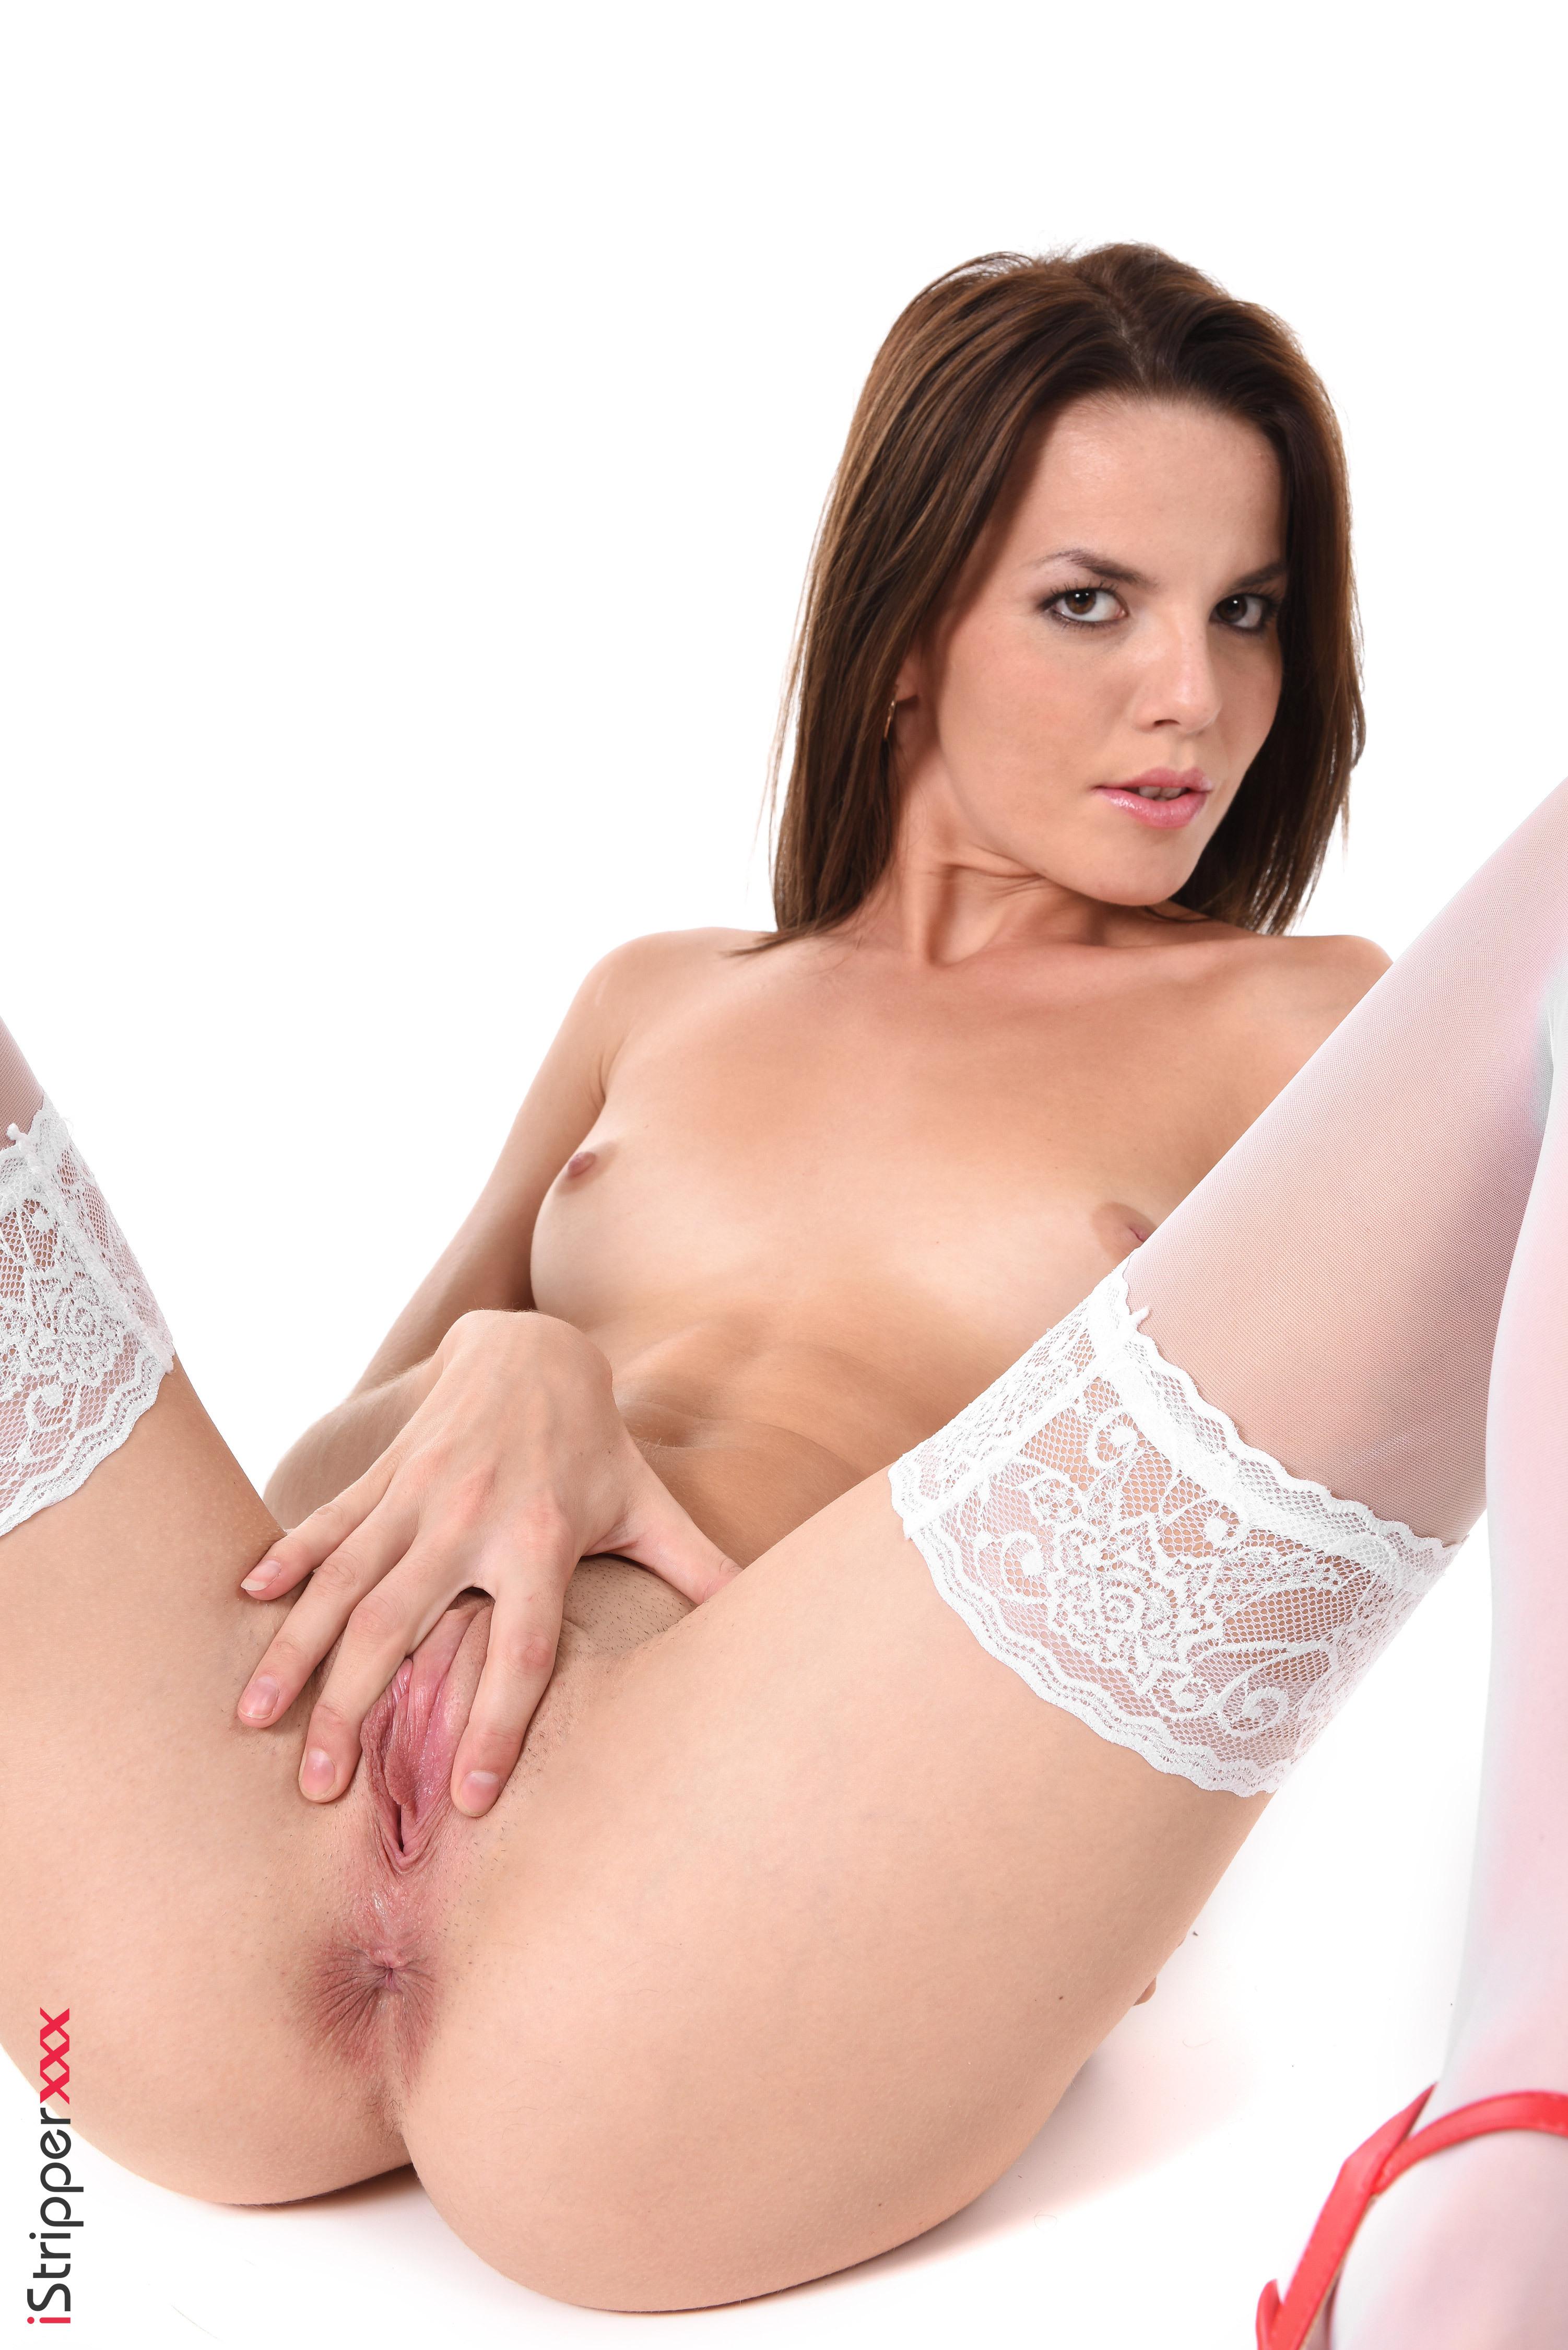 virtual stripper for mobile